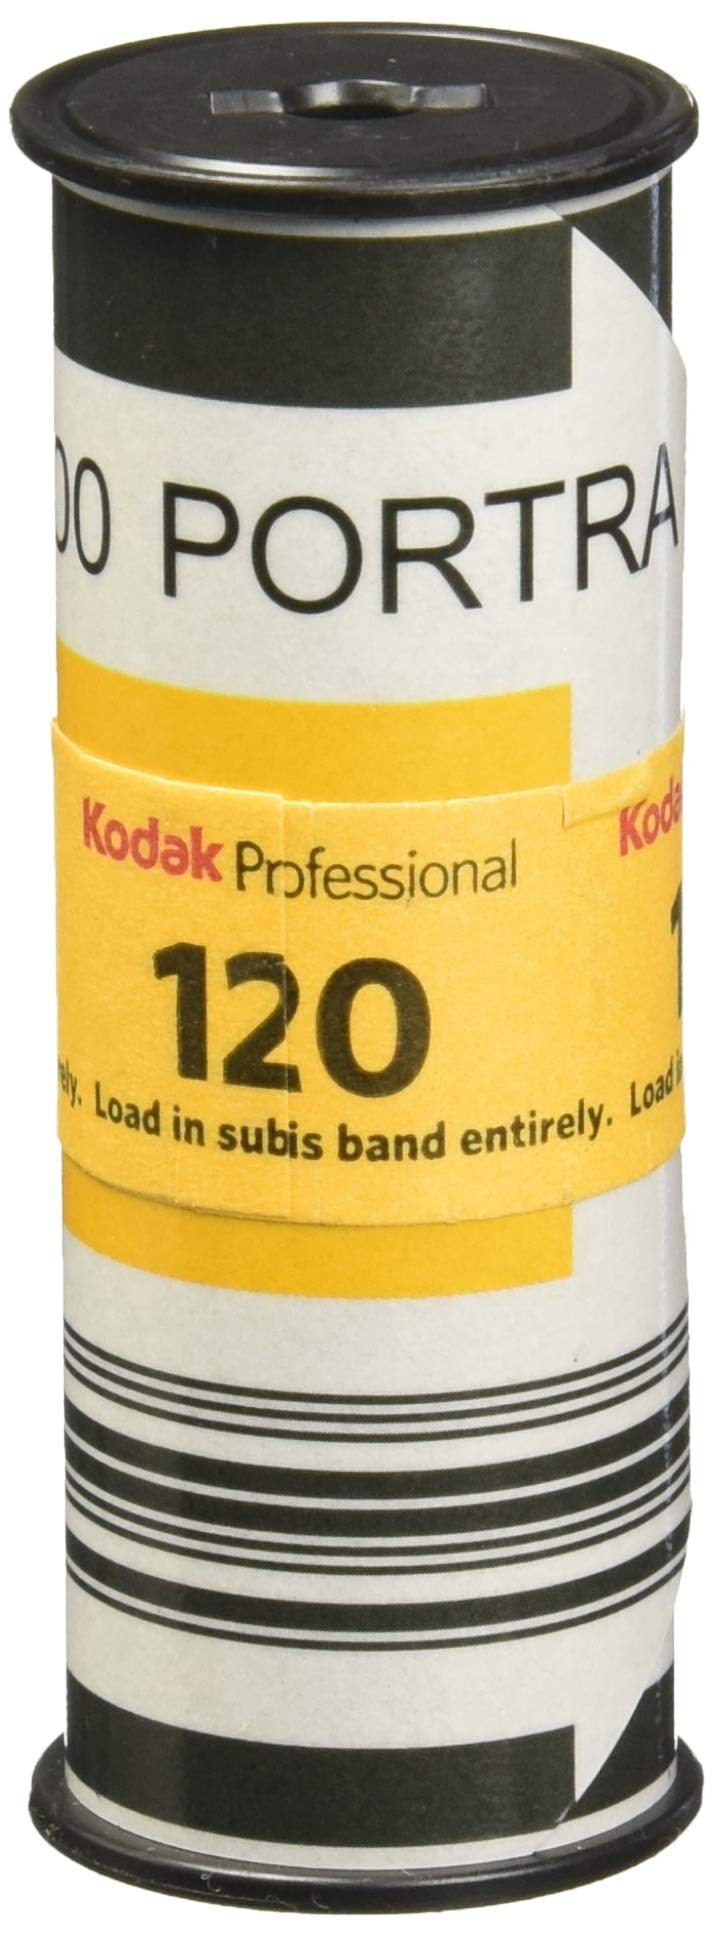 Kodak 120 Portra 400 Film